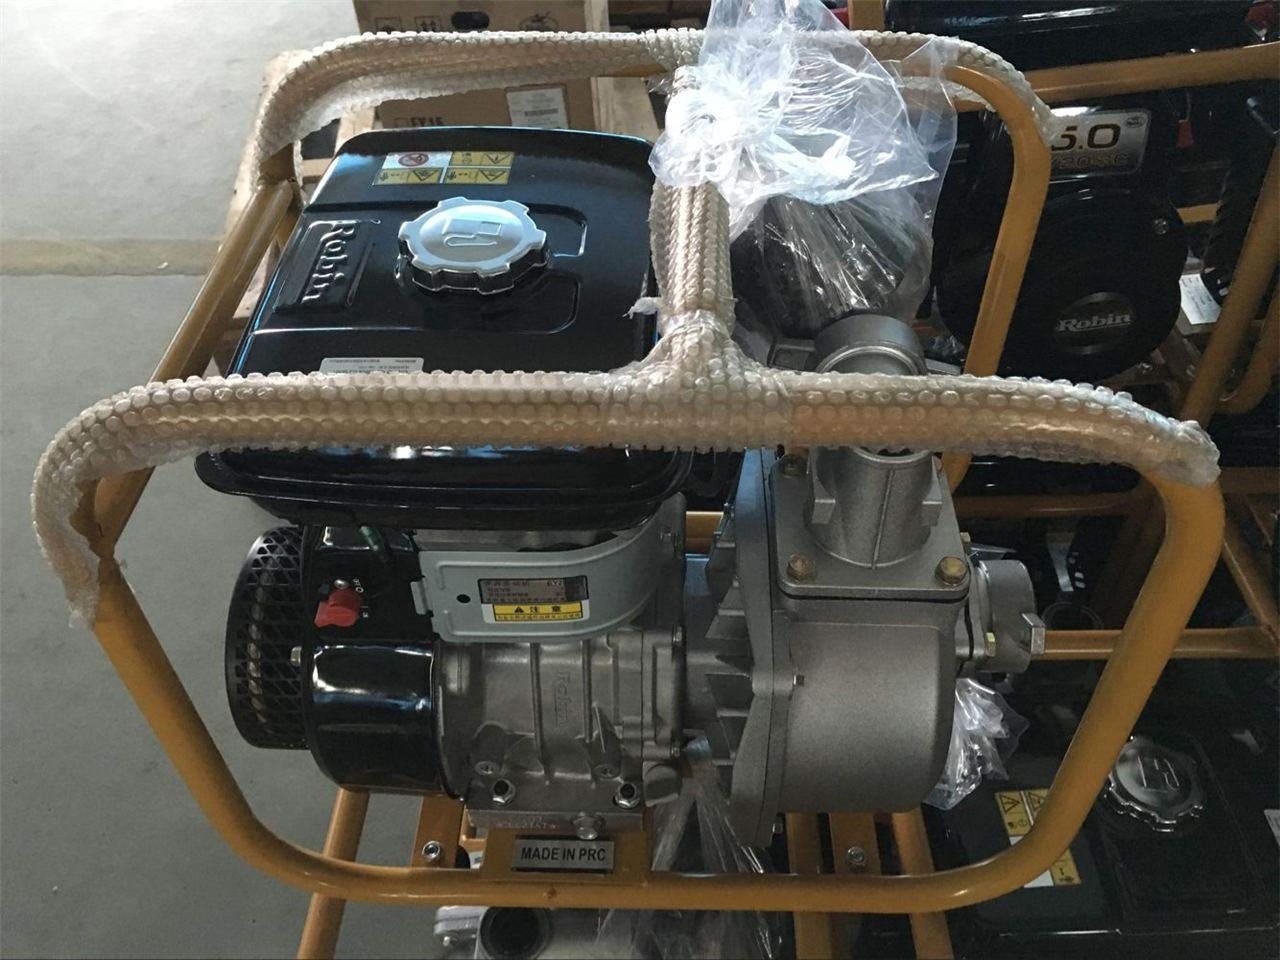 Agriculture Petrol Station Spray Pump for Farm